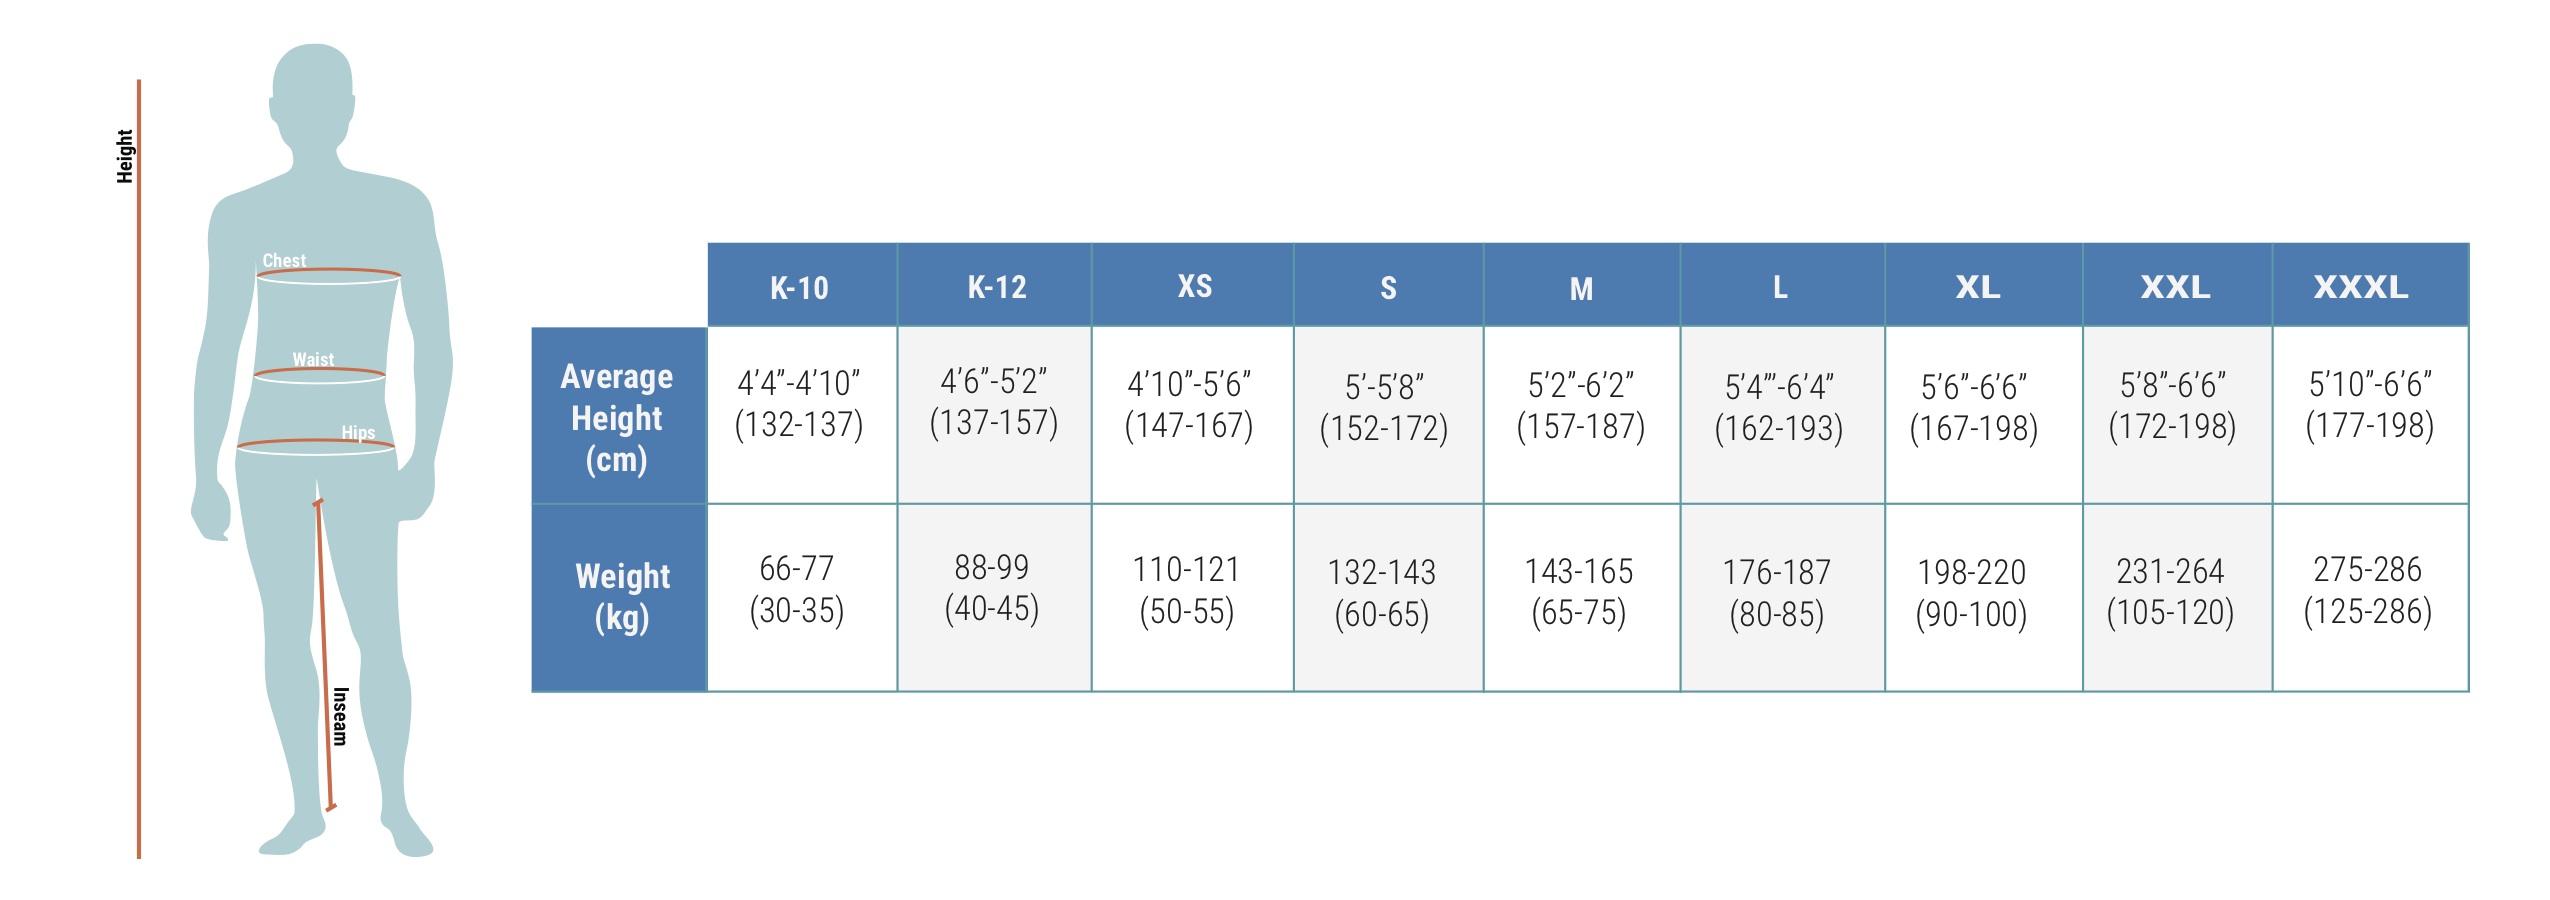 fwg-zhik-mens-sizing-chart.jpg